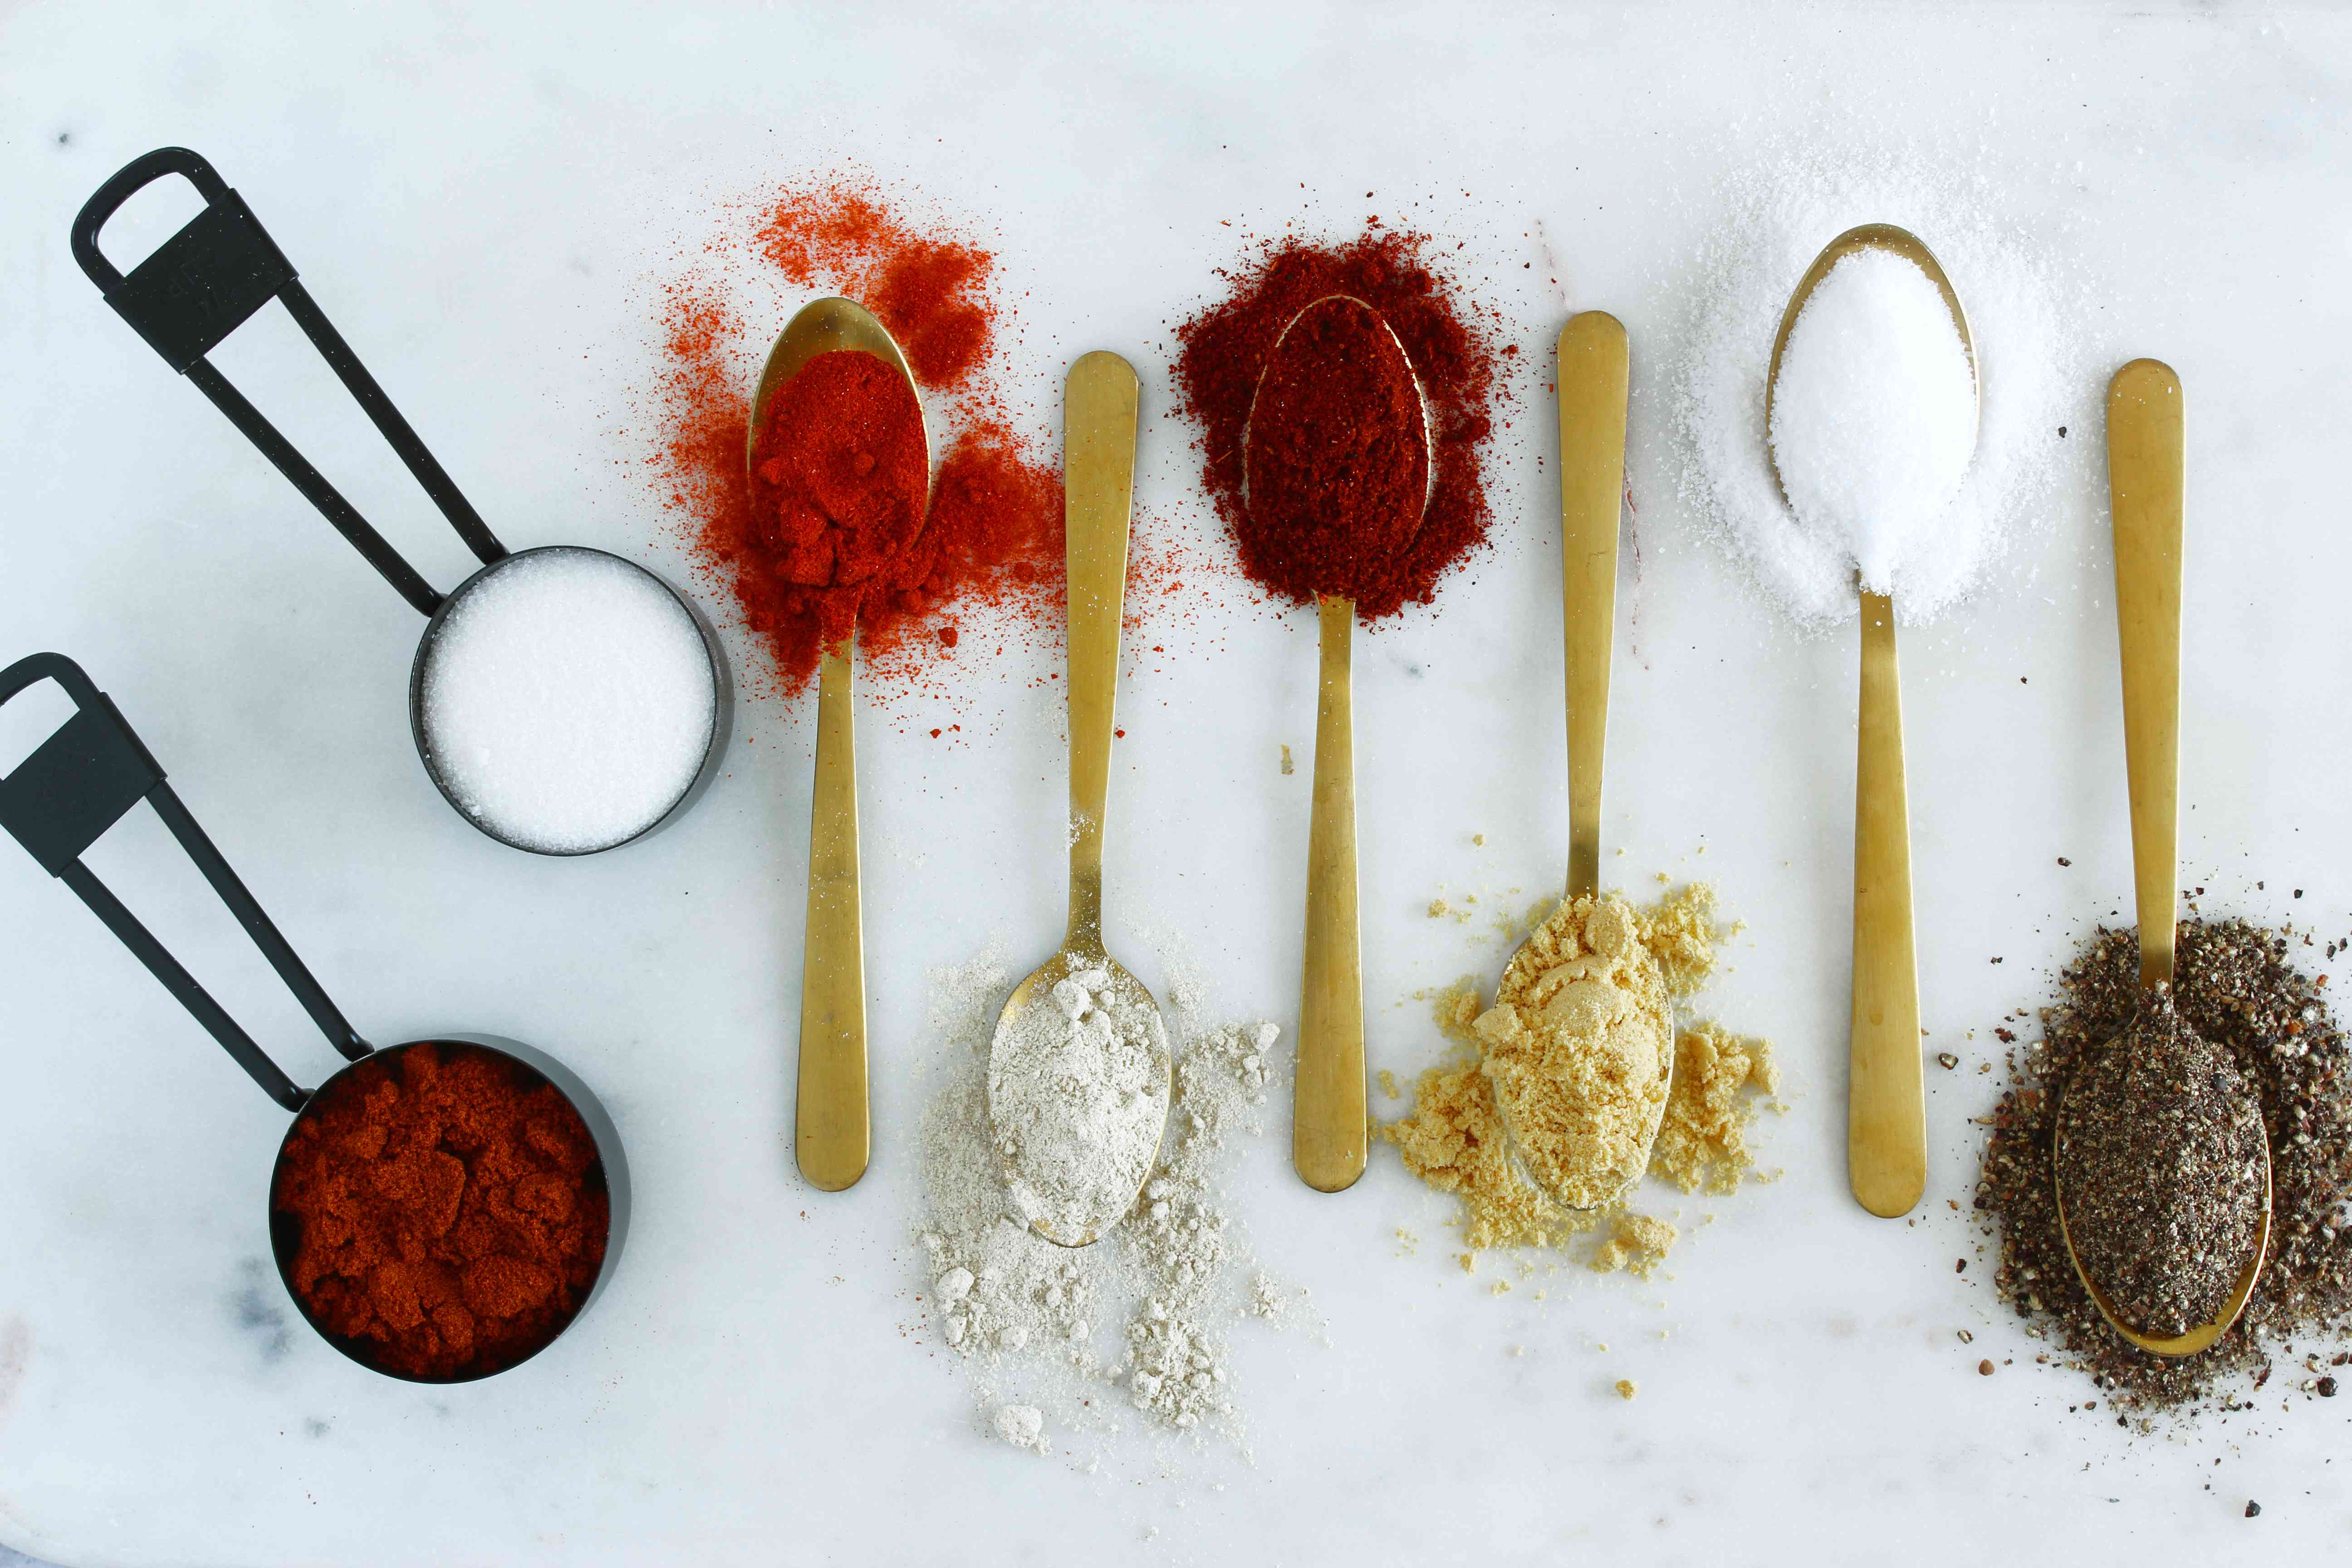 Ingredients for pork rub